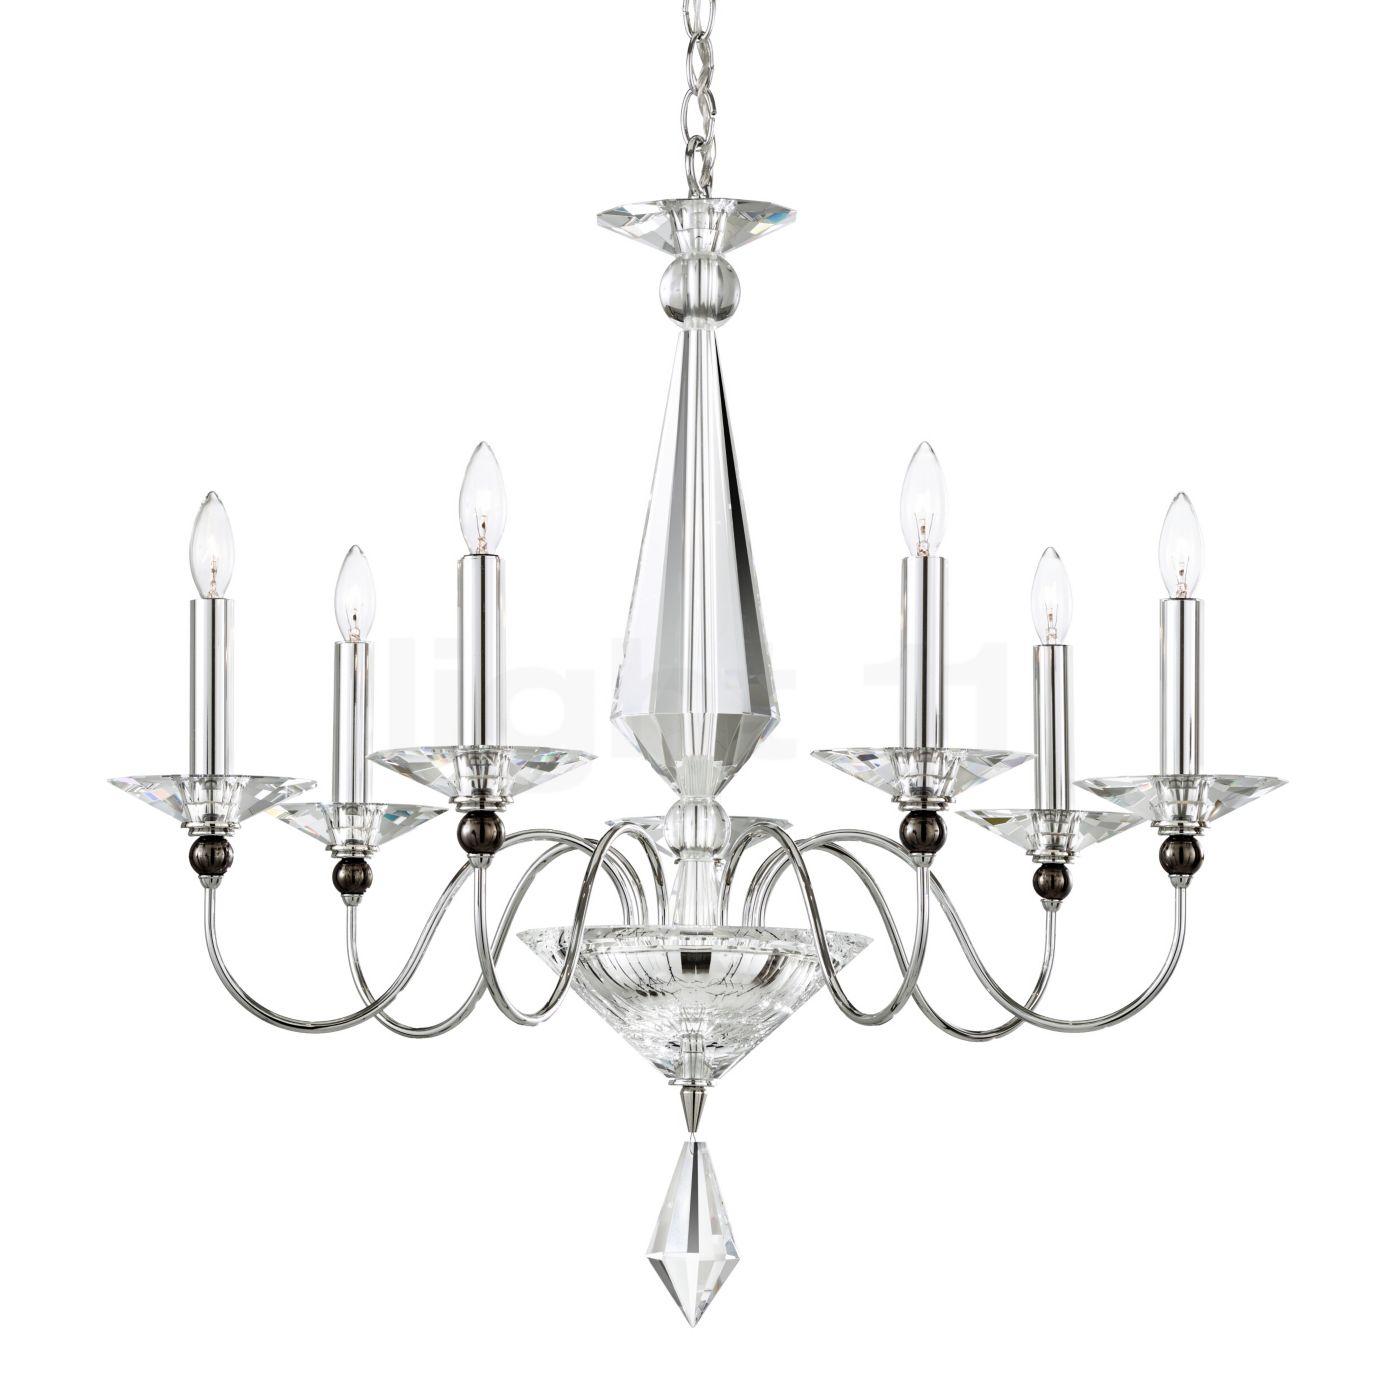 crystal s top interiors chandelier harrison detail fine art lighting shop antiques schonbek